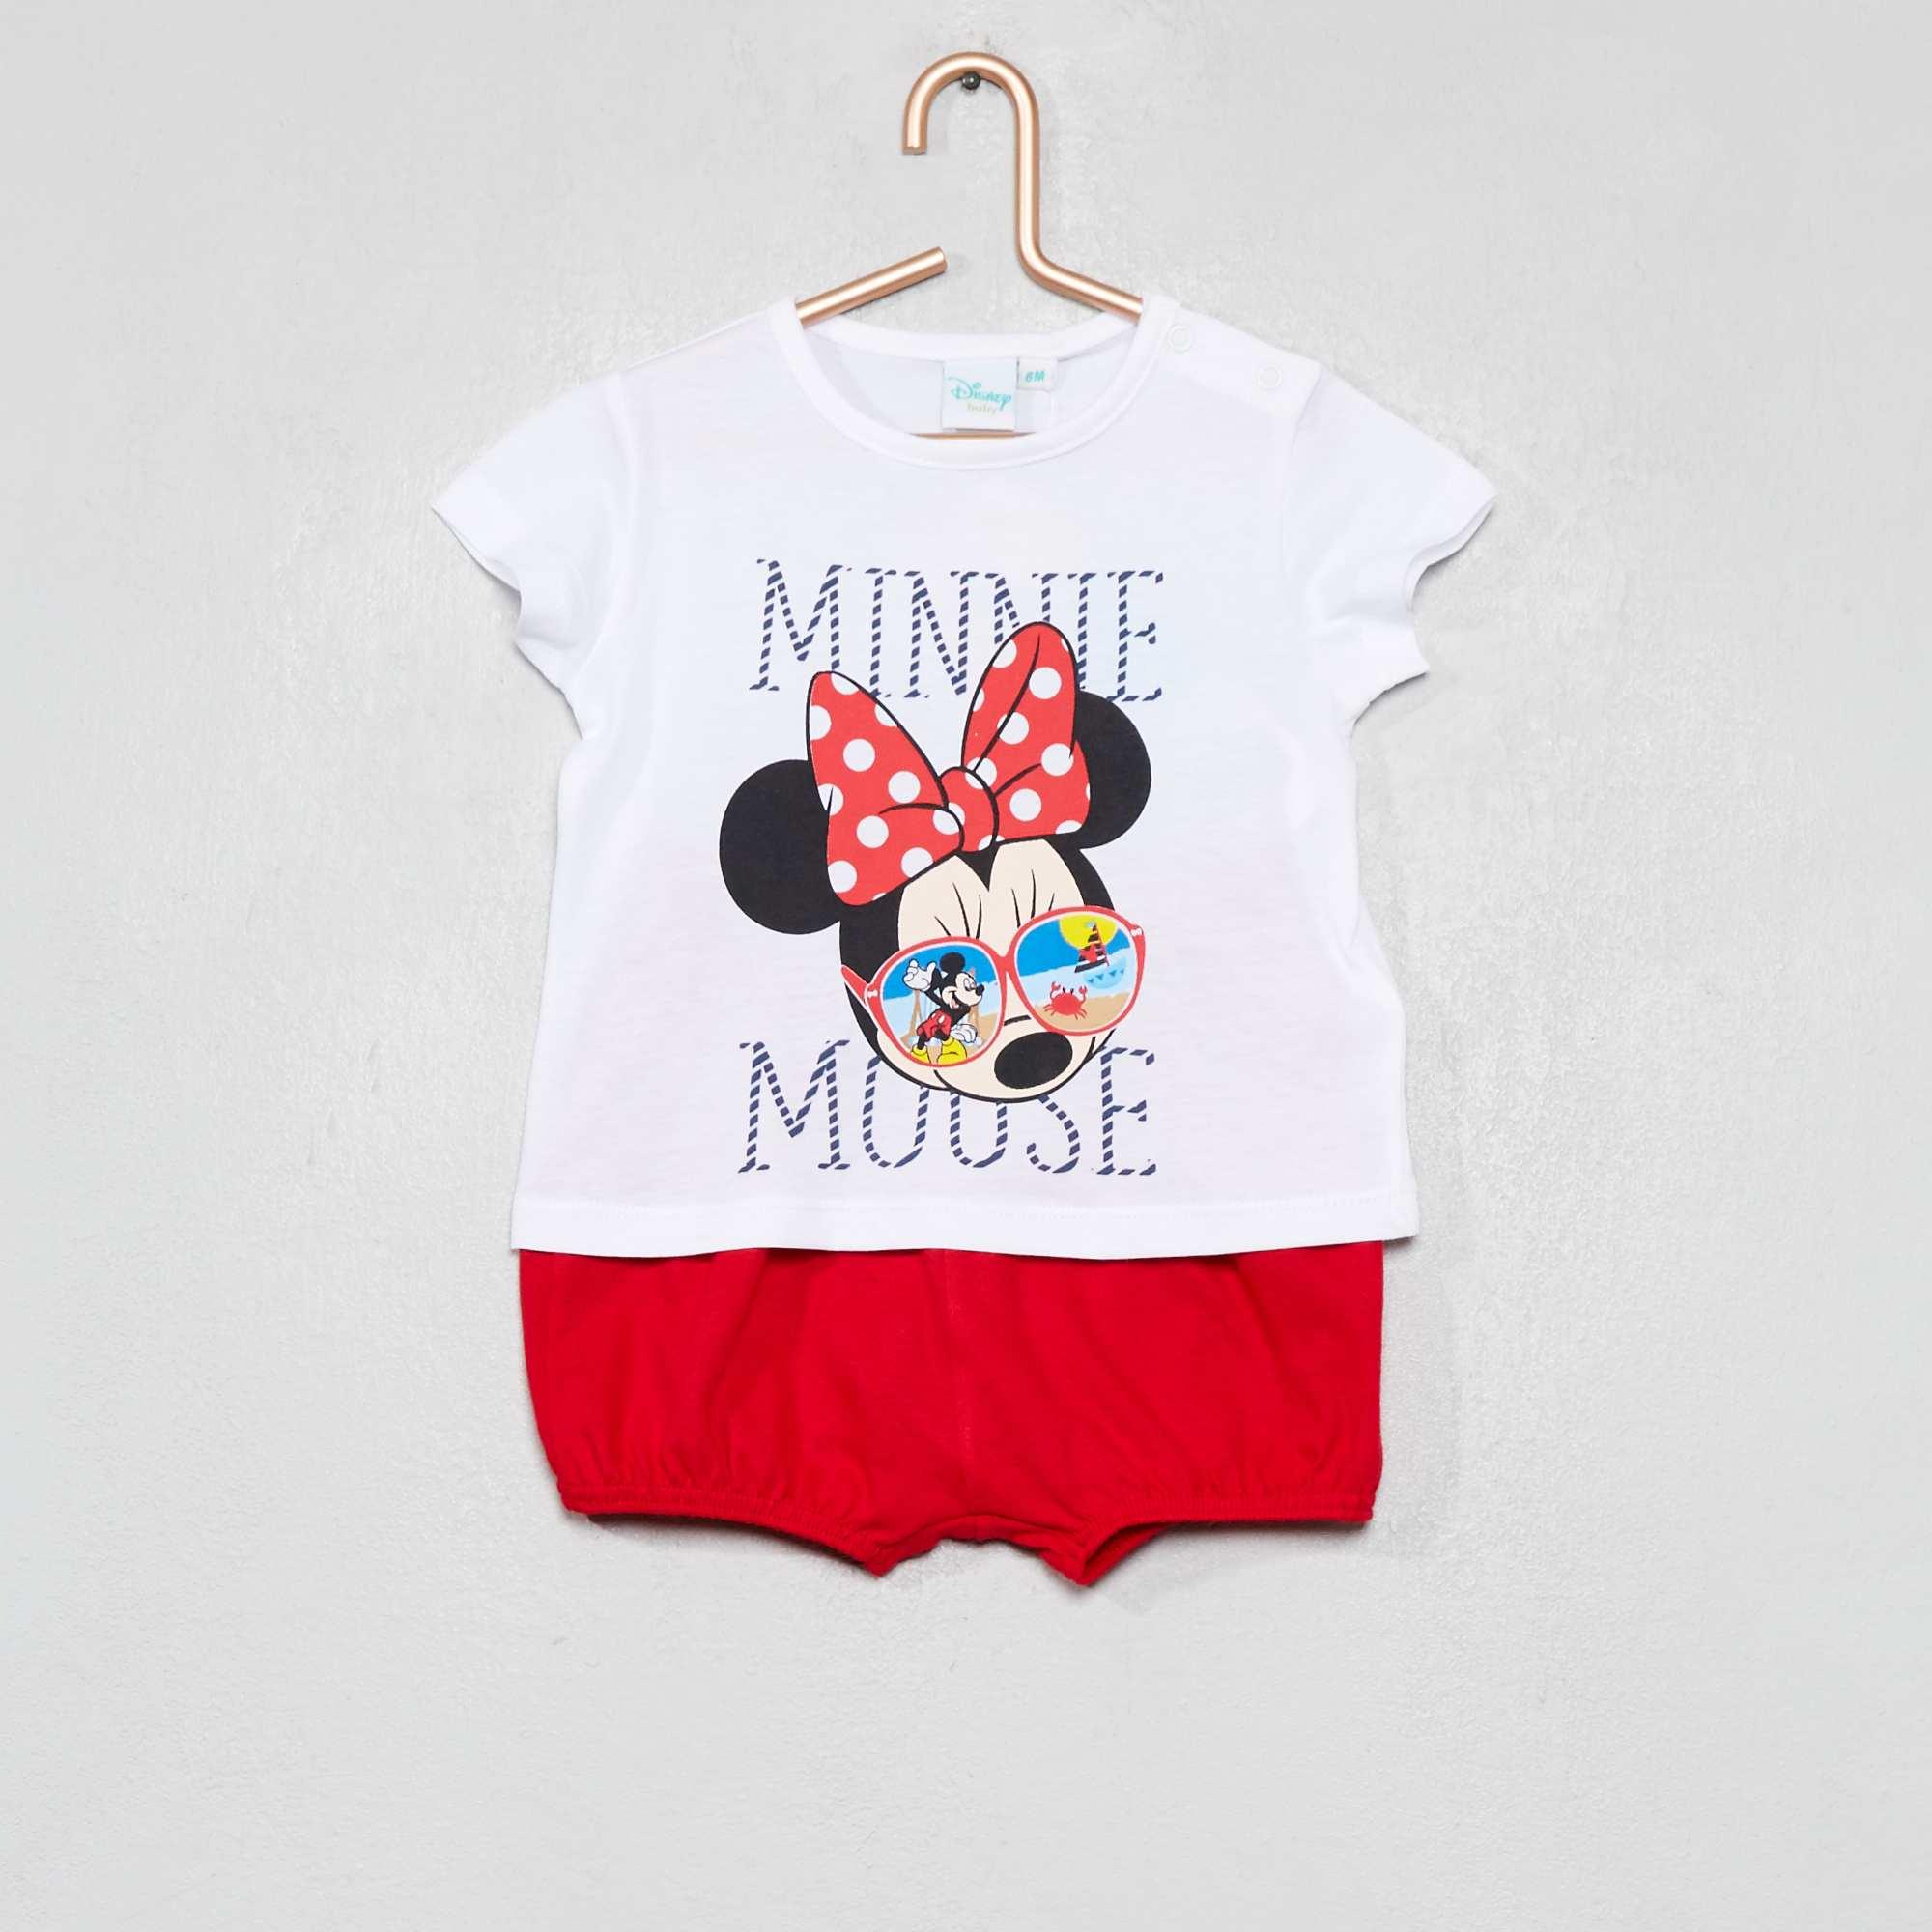 175190a3454 Conjunto de camiseta + short  Minnie  Bebé niña - BLANCO - Kiabi ...